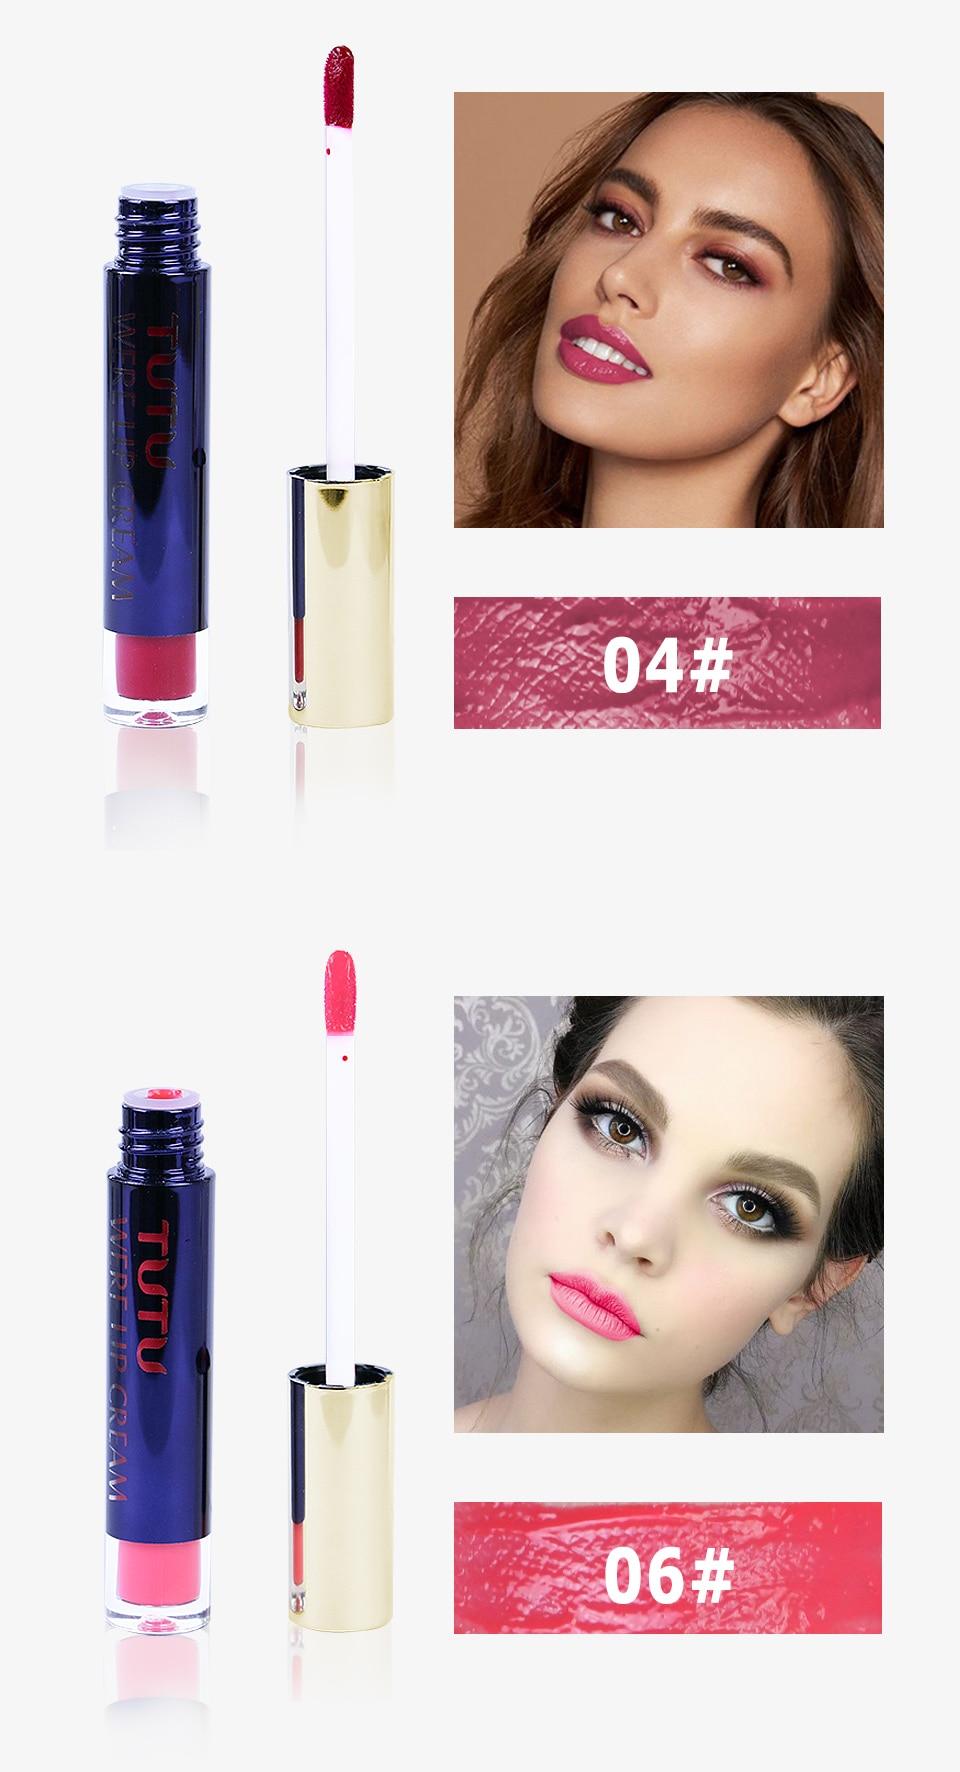 Professional Lip Makeup Matte Lip Gloss Velvet Red Lipstick Liquid Tint Waterproof Moisturizer Full Color Lip Gloss Set Make up 9